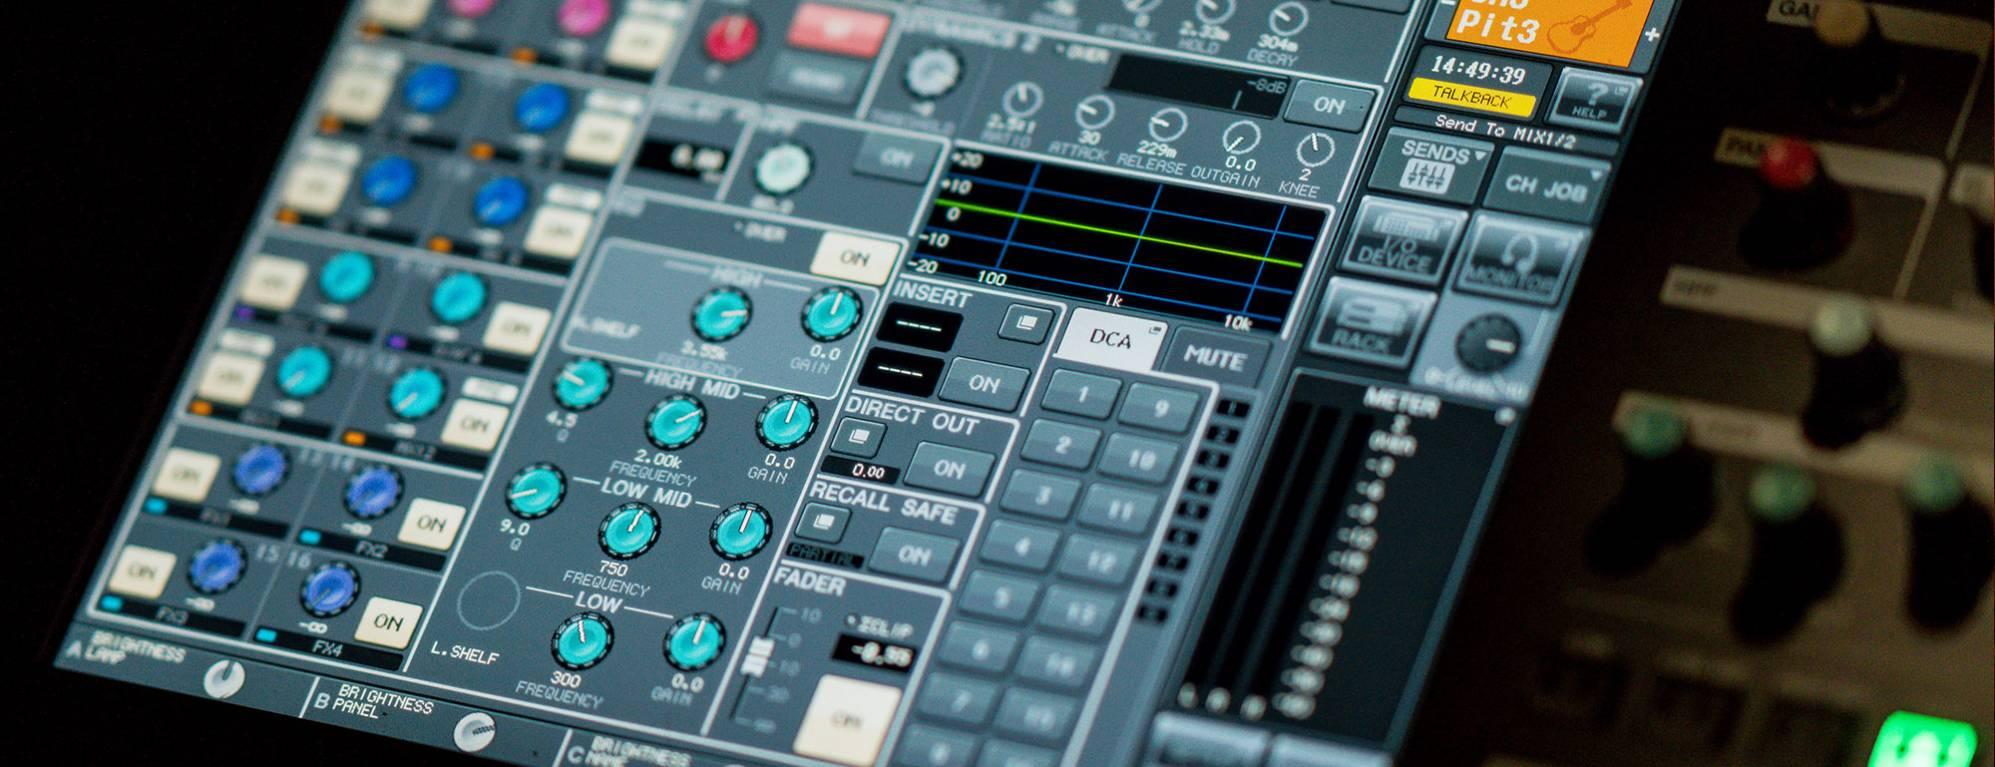 A digital screen for a technical mixing desk